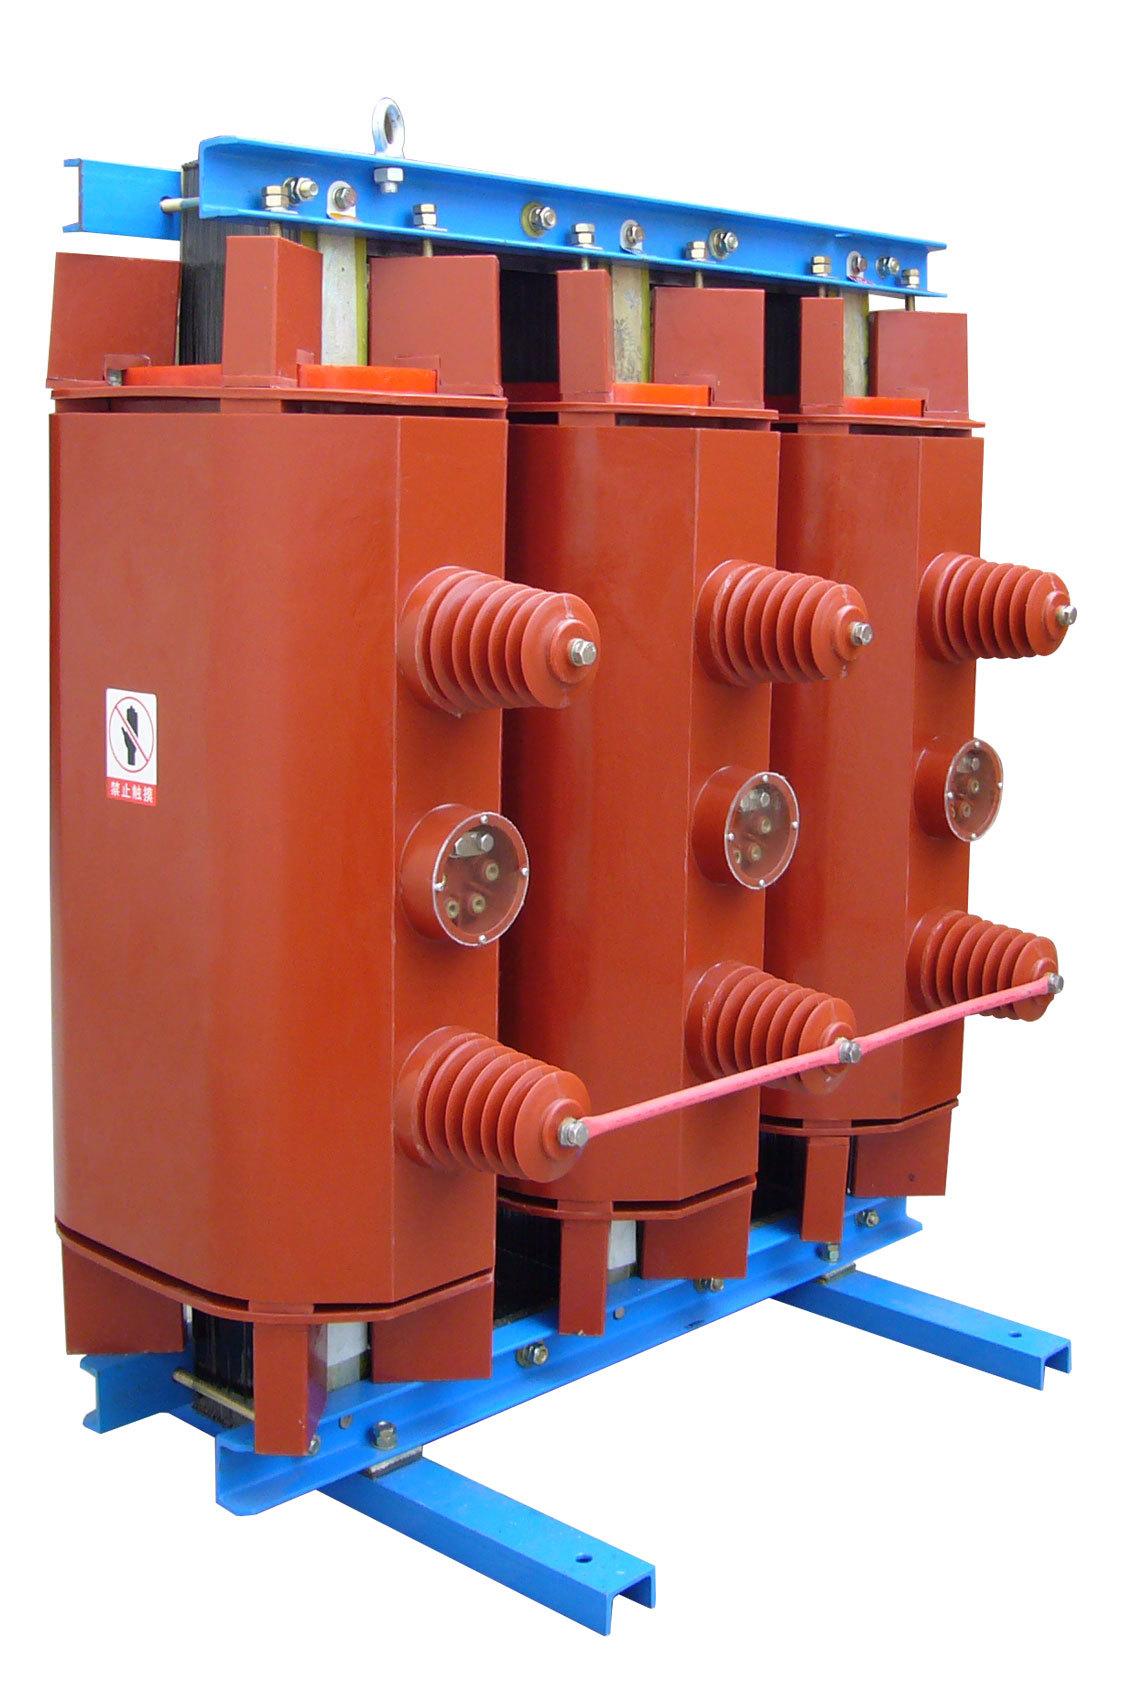 ld b10温控器lw dq_干式变压器风机lw dq_干式控制变压器